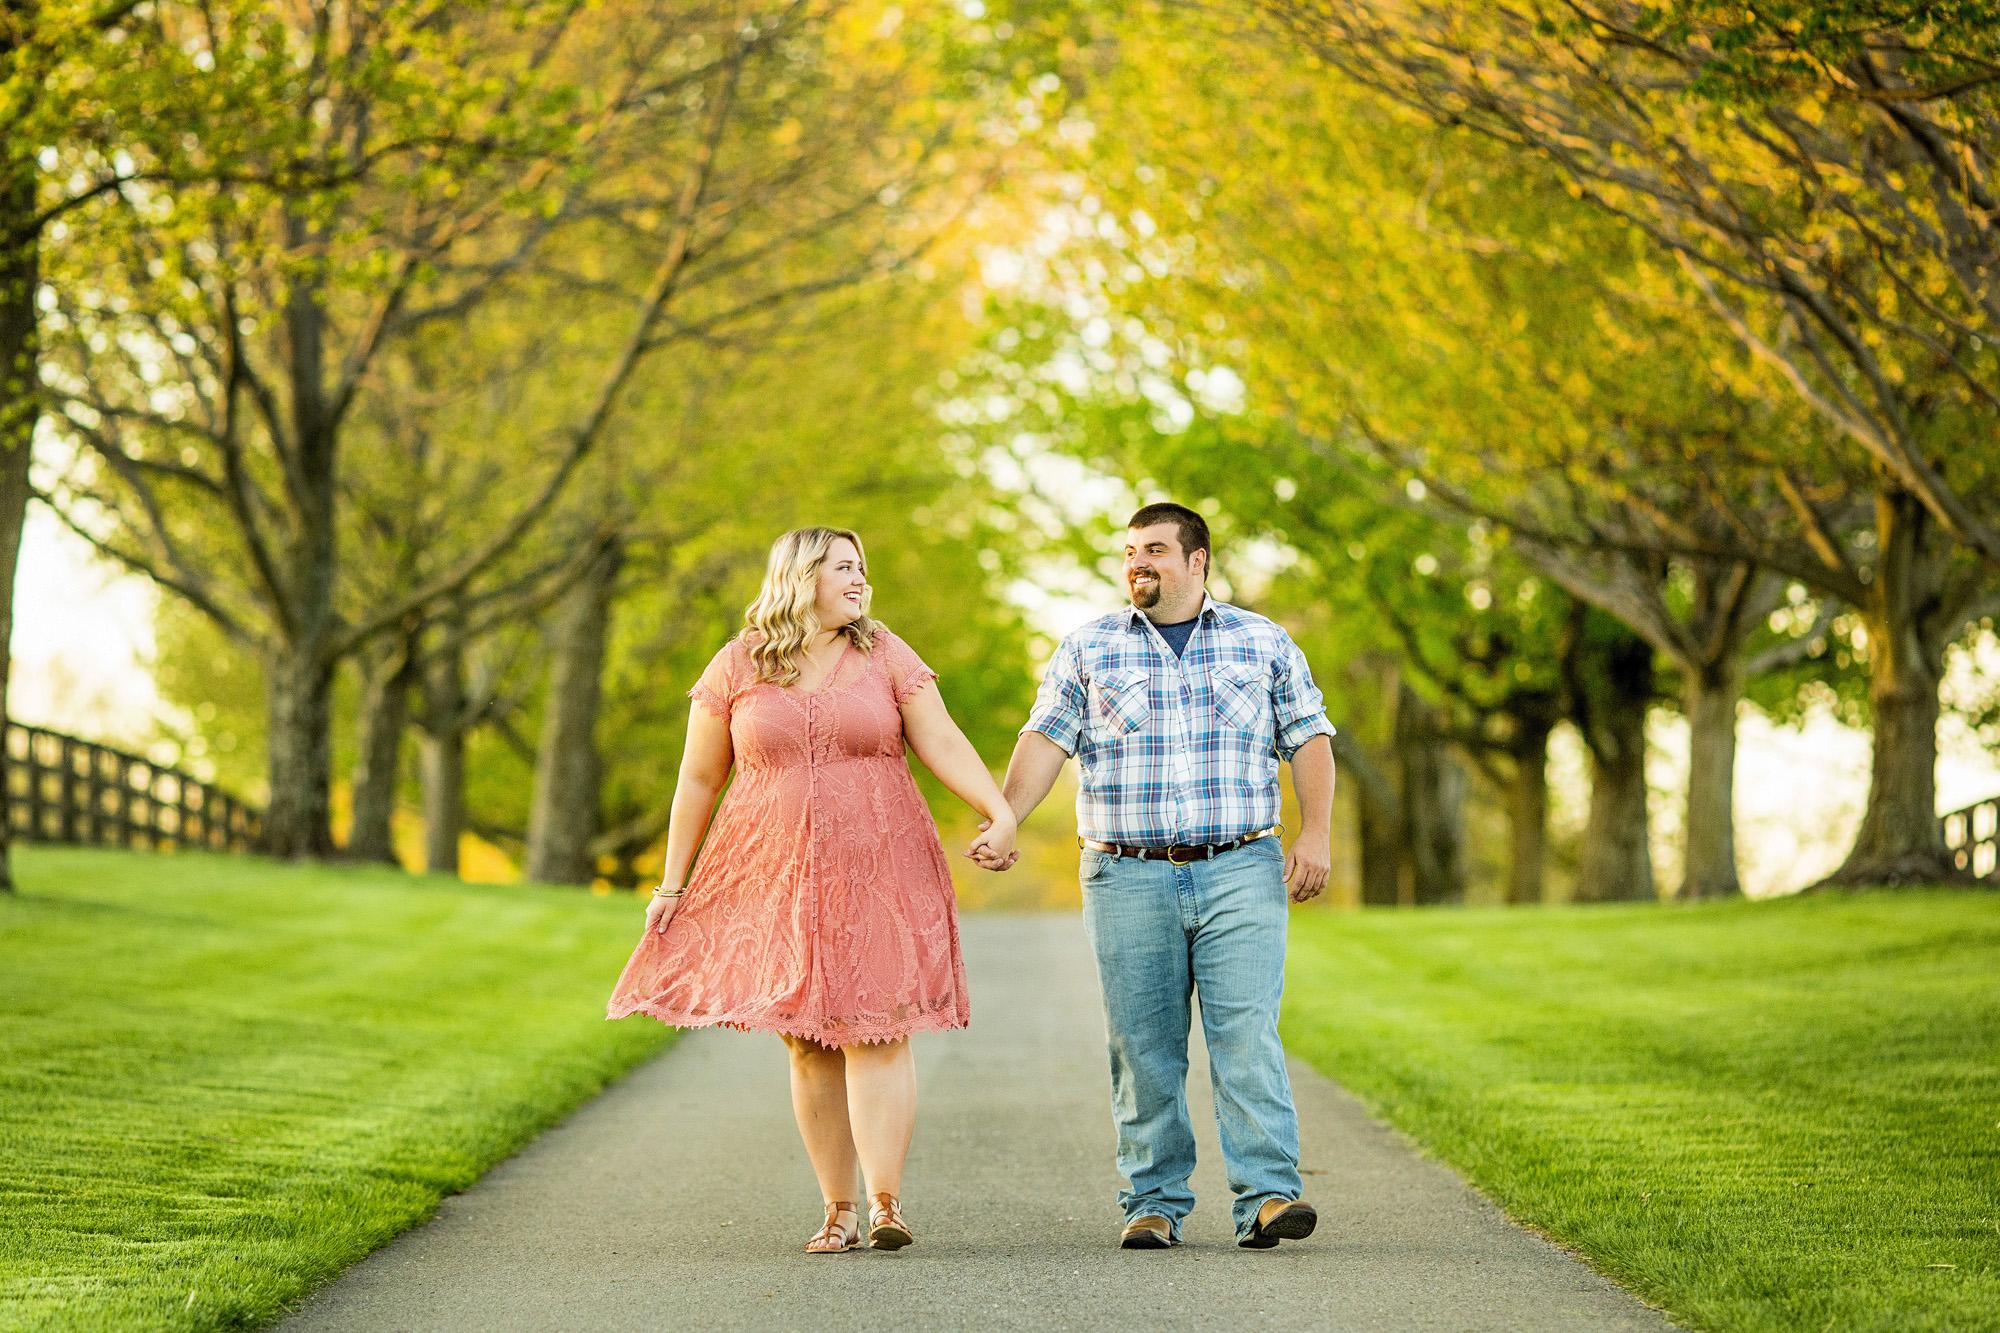 Seriously_Sabrina_Photography_Lexington_Kentucky_Sunset_Farm_Engagement_Cody_Sara_34.jpg